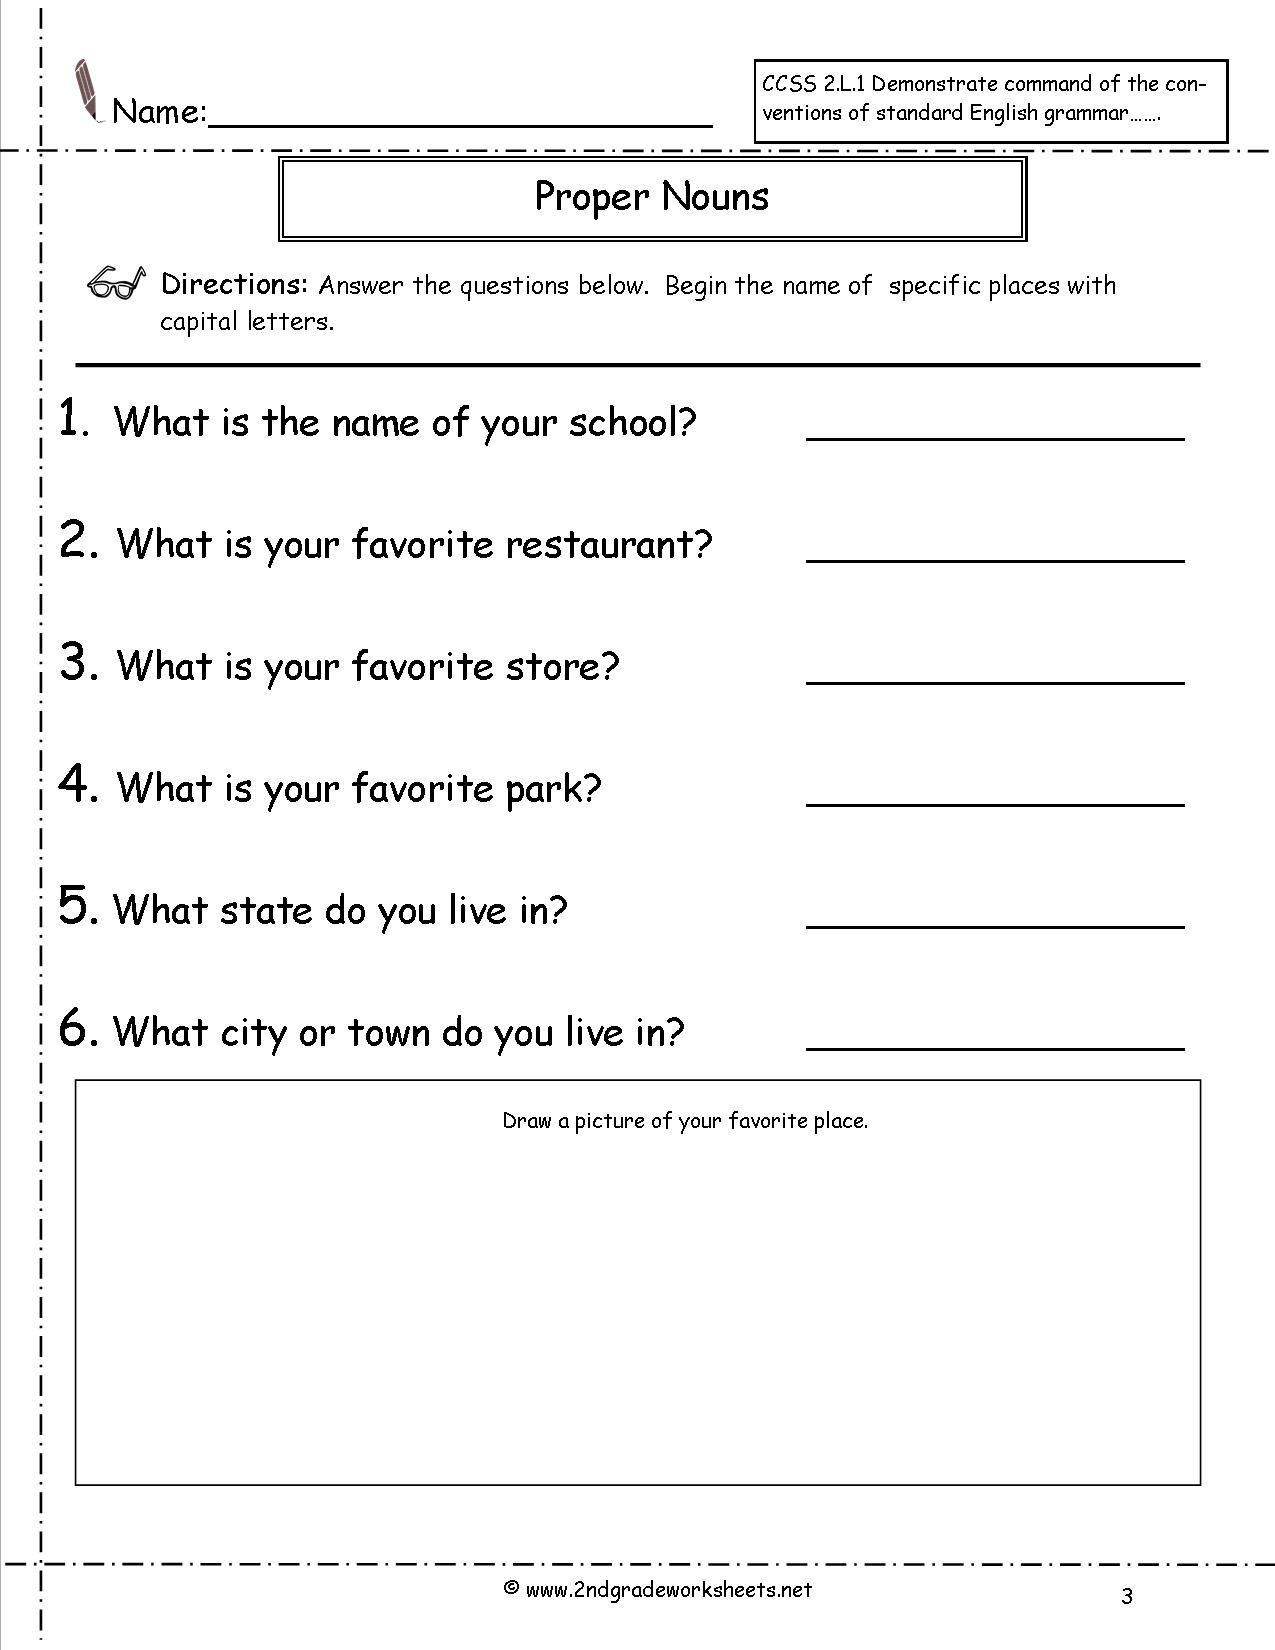 Proper Nouns Worksheet 2nd Grade Mon and Proper Nouns Worksheet